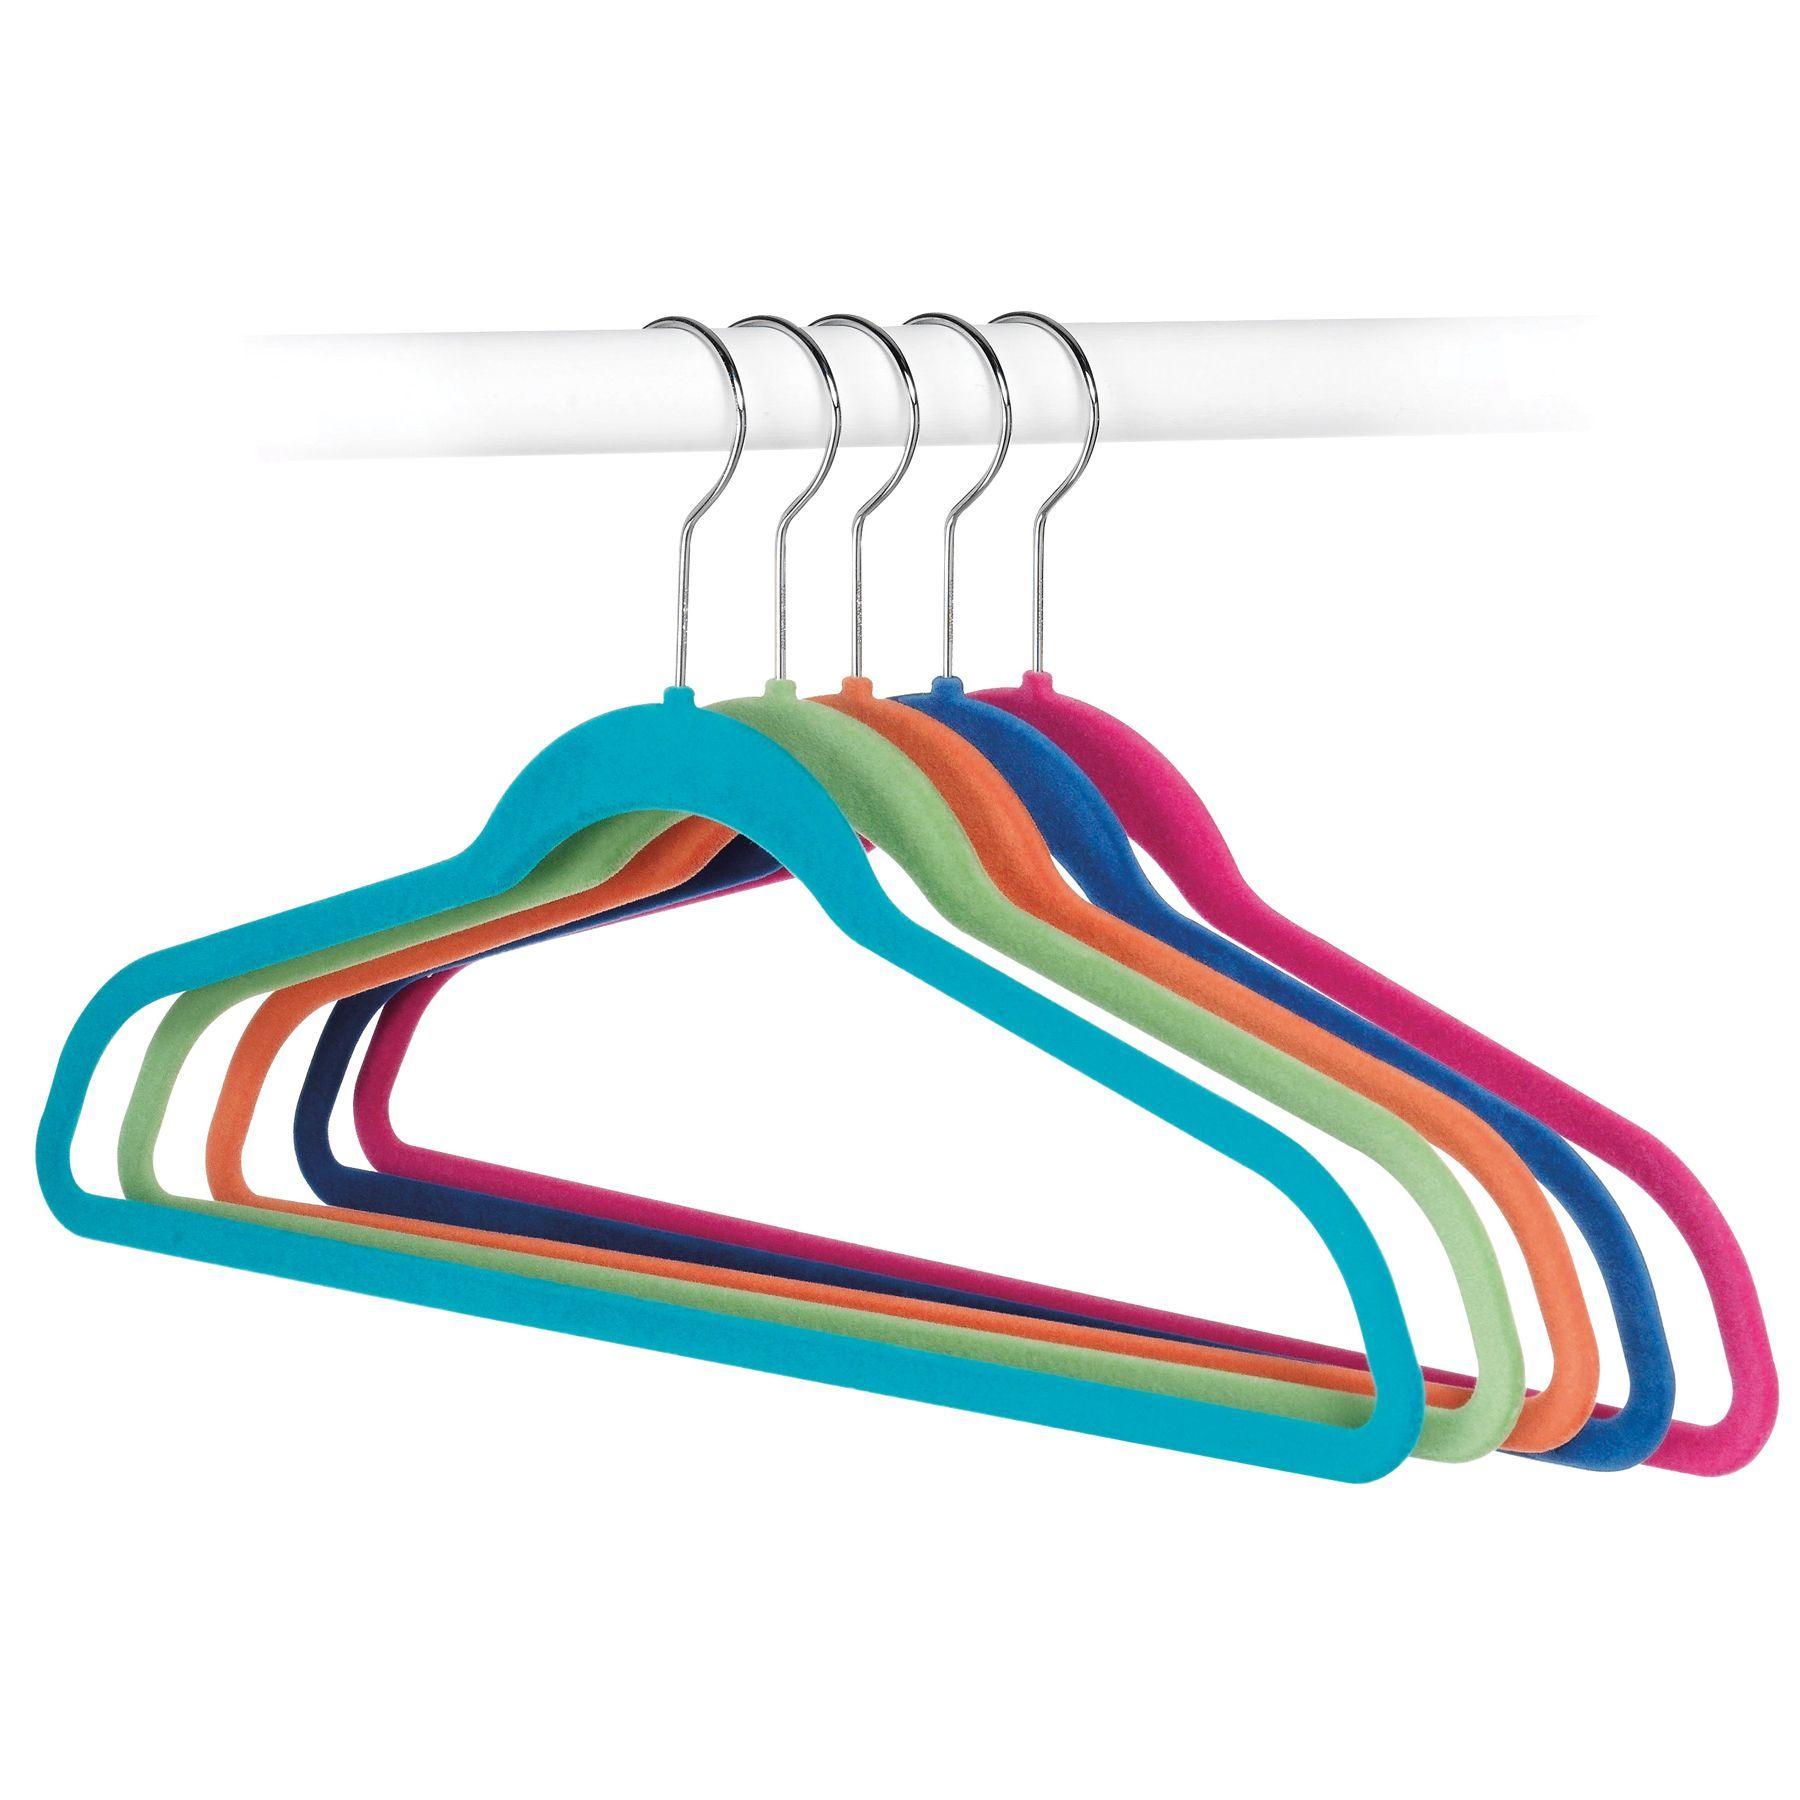 Whitmor 6784-1621-5 Flocked Suit Hangers Assorted Colors 5-ct (Hangers), Multi